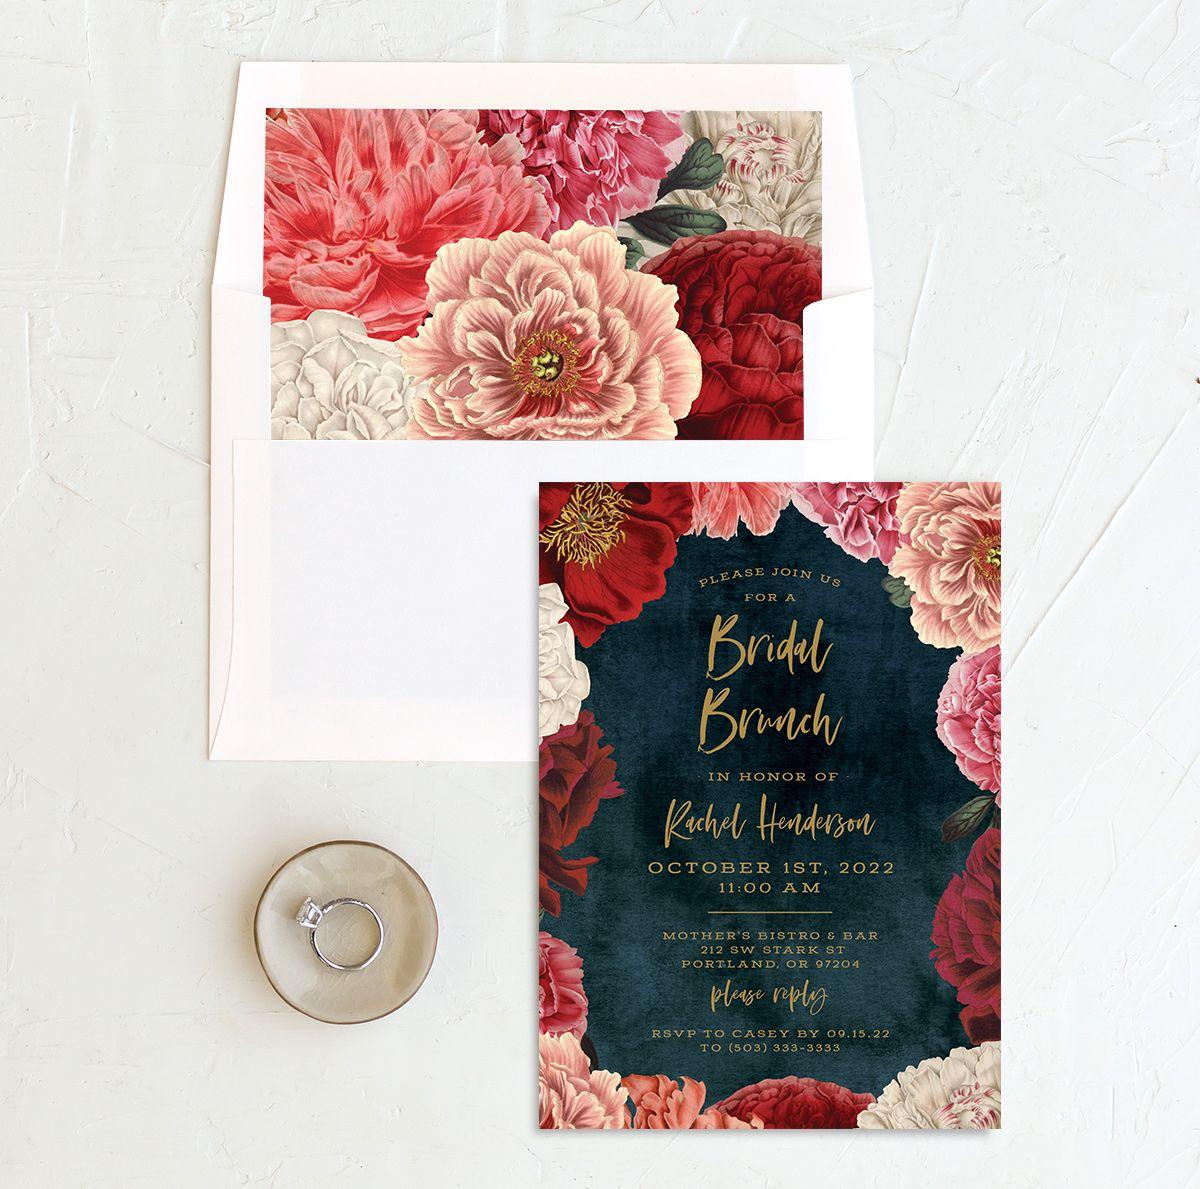 Midnight Peony Bridal Shower Invitation and Envelope Liner